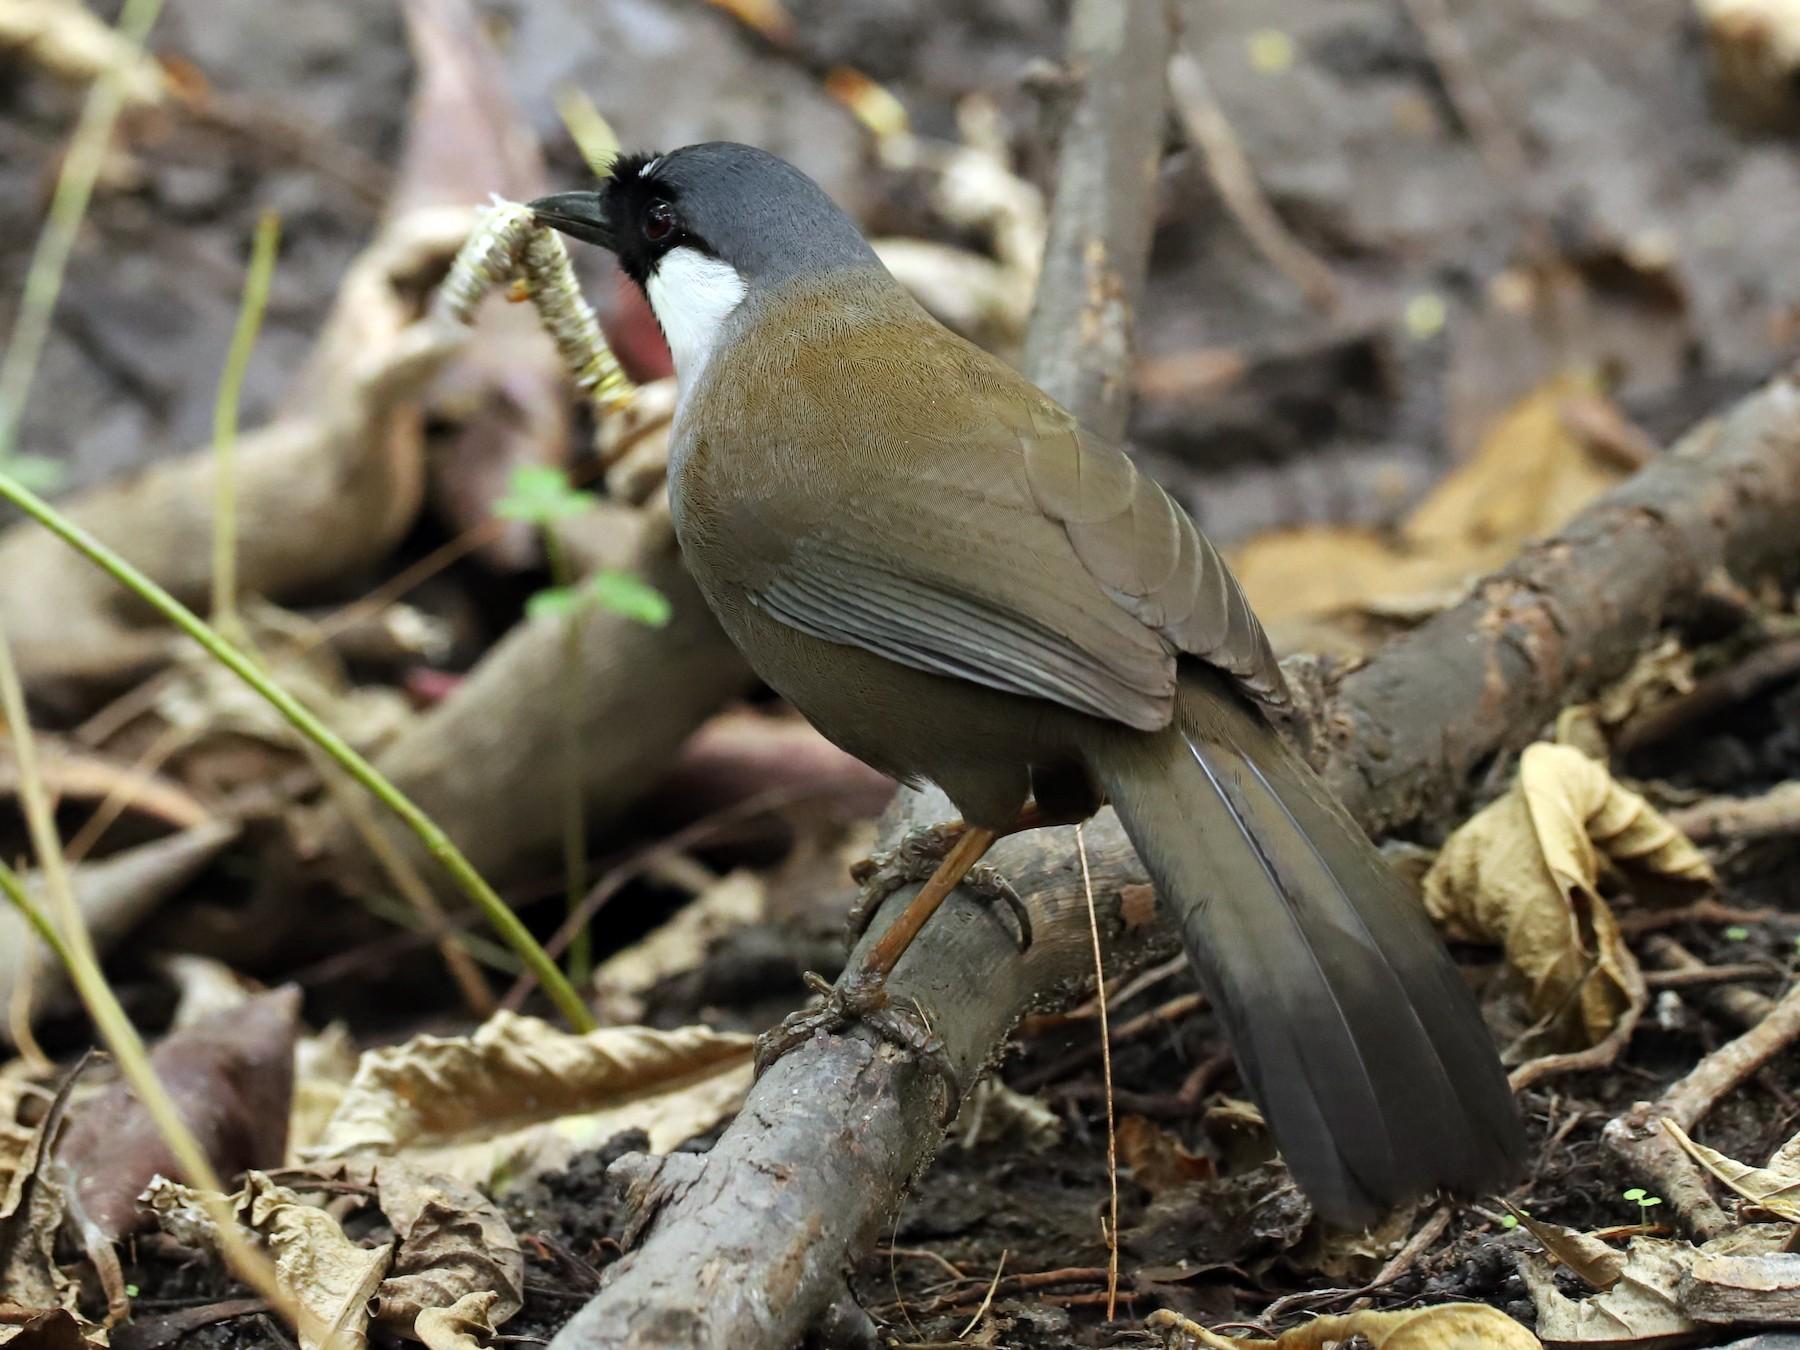 Black-throated Laughingthrush - Are Nakrem